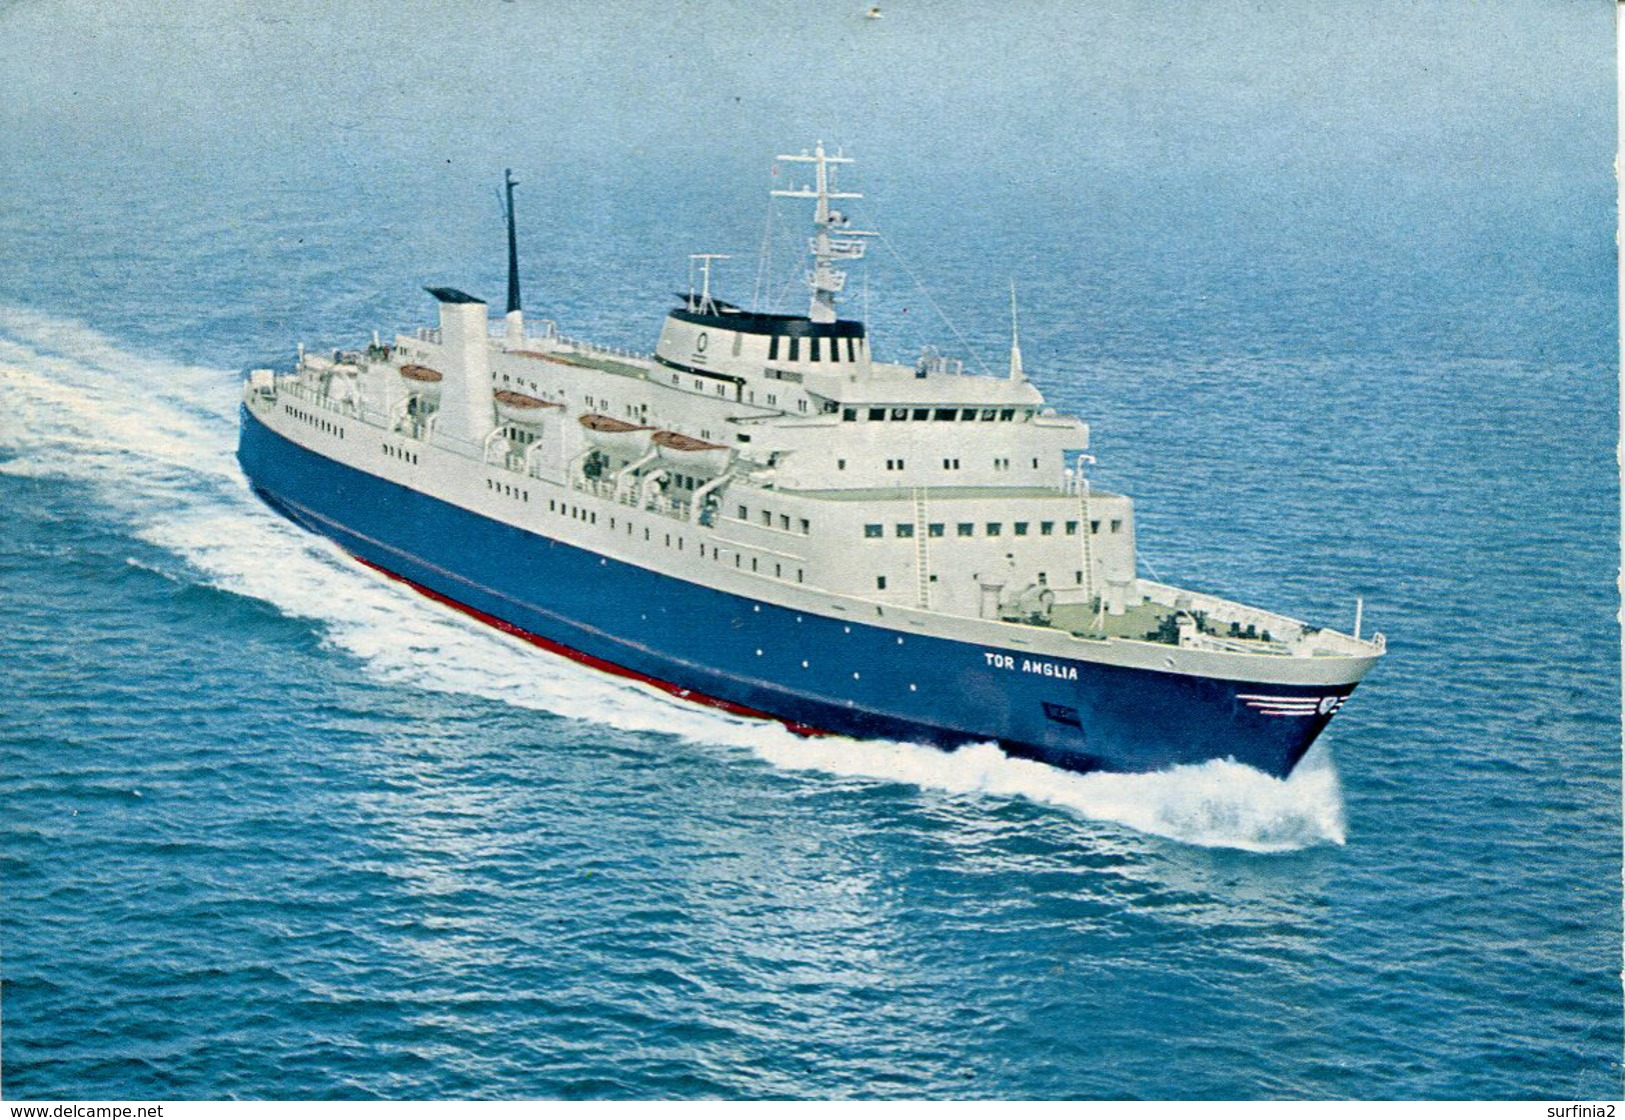 SHIPPING - M/S TOR ANGLIA Ship128 - Steamers